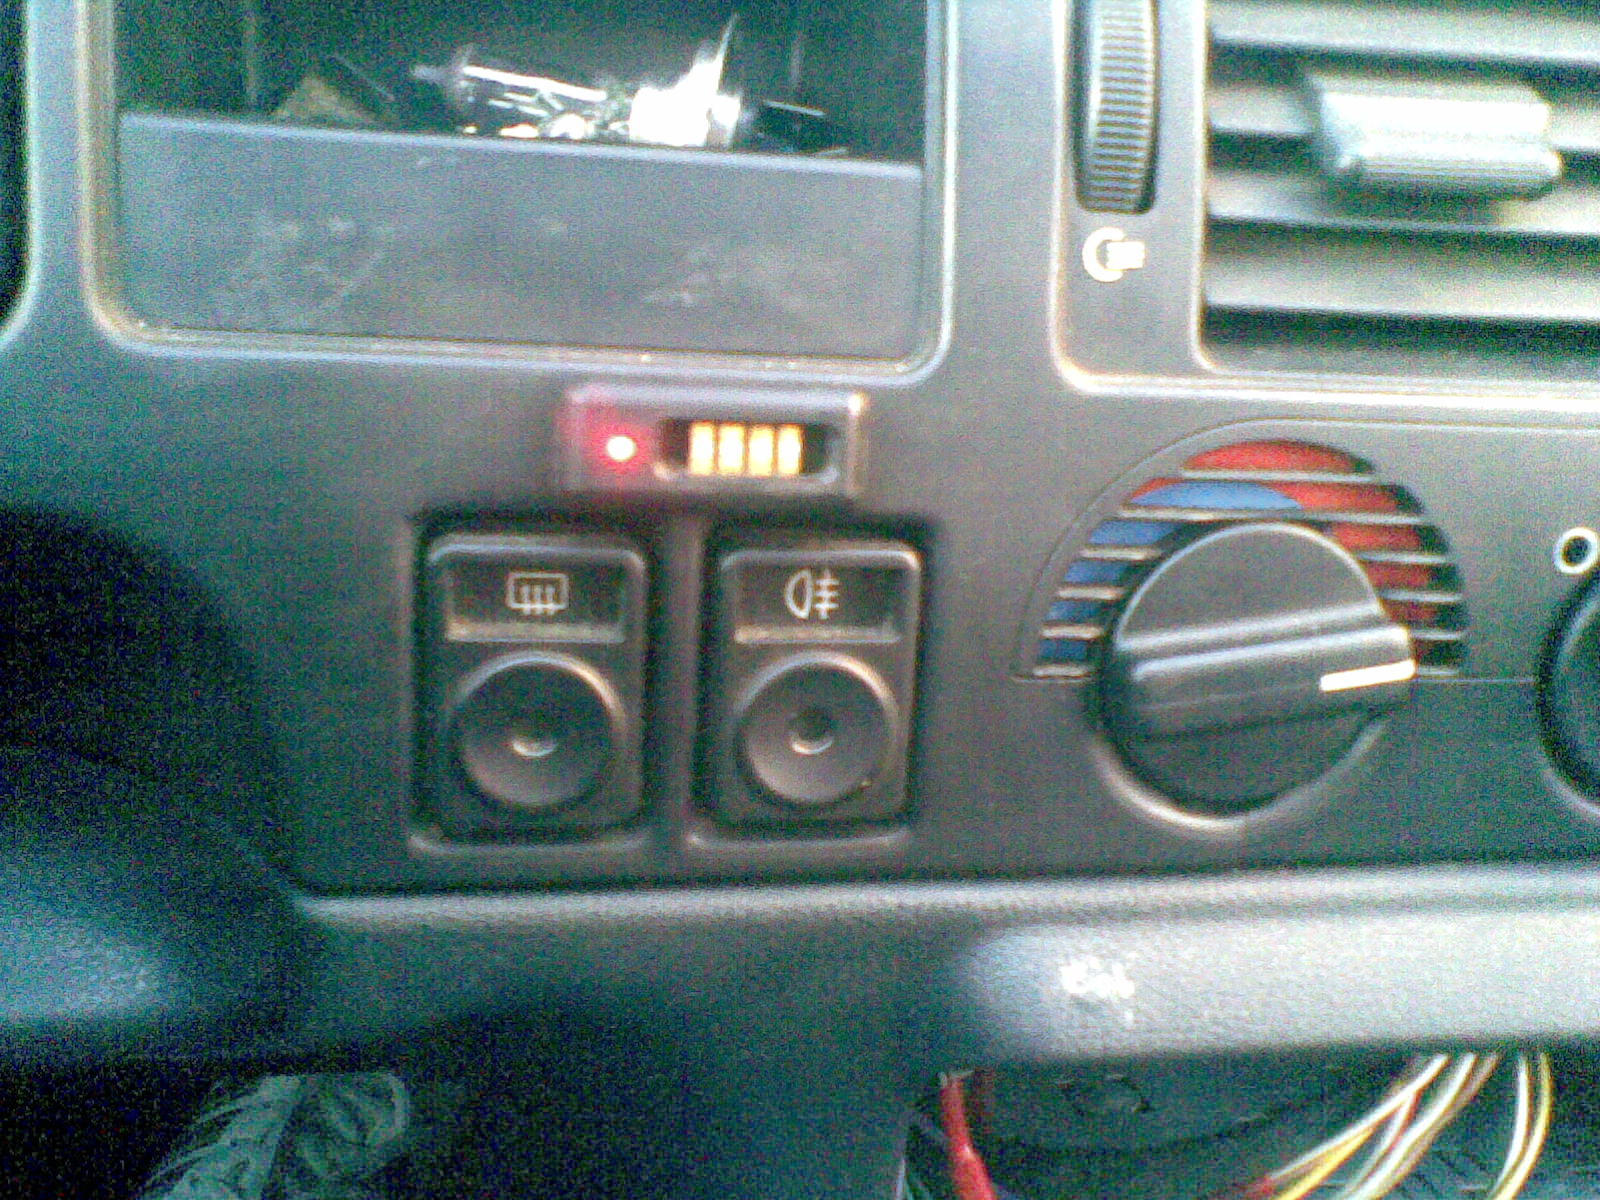 Dorobienie immobilisera lub jego demonta� - Ford Escort 93r